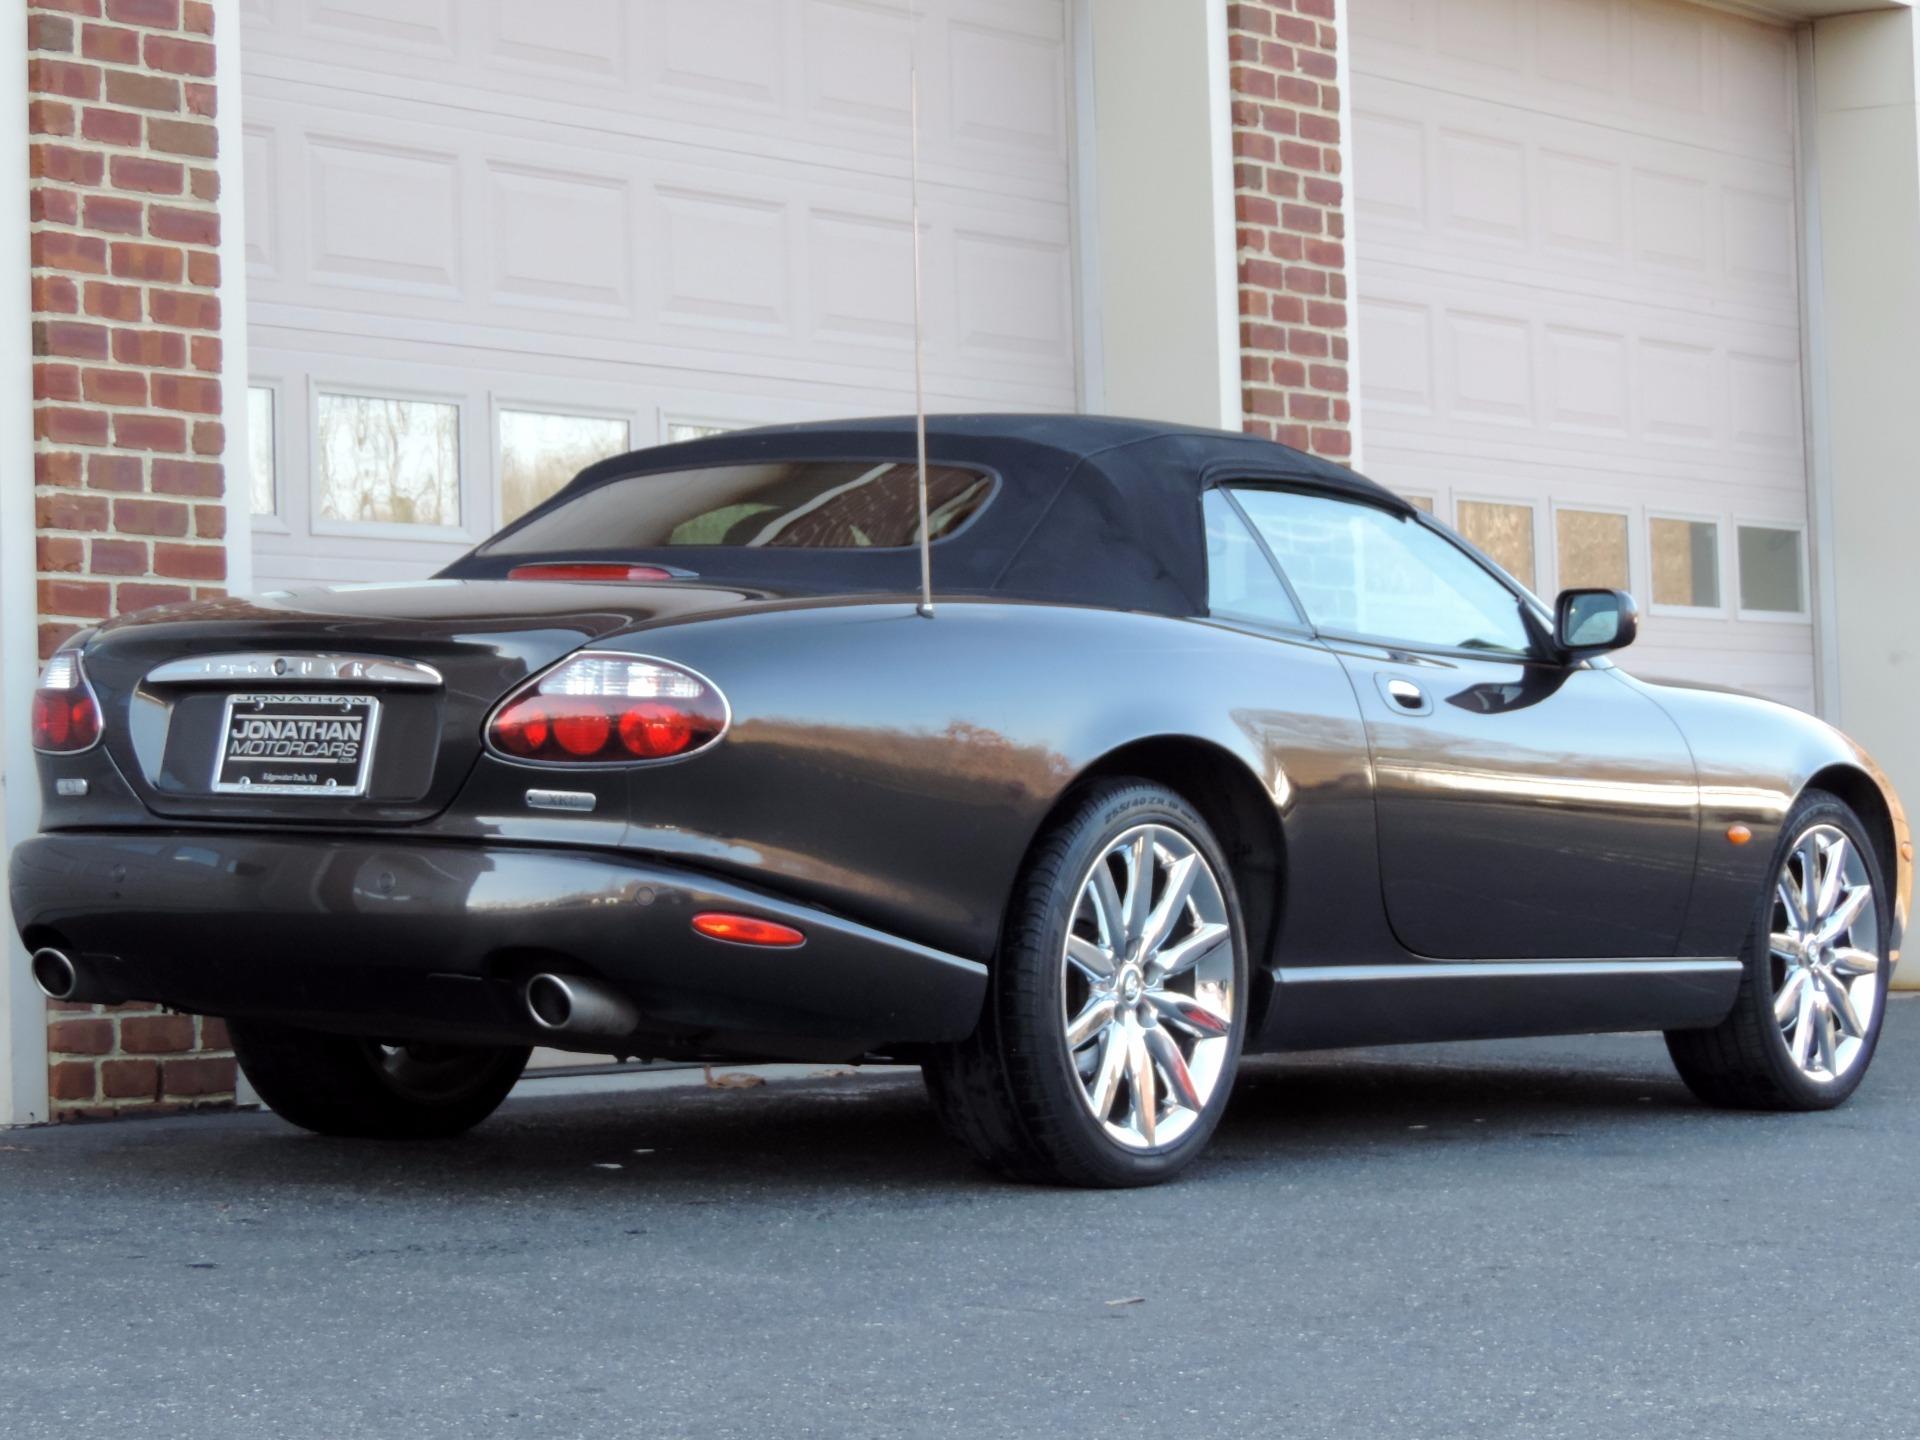 2006 Jaguar Xk Series Xk8 Stock A48347 For Sale Near